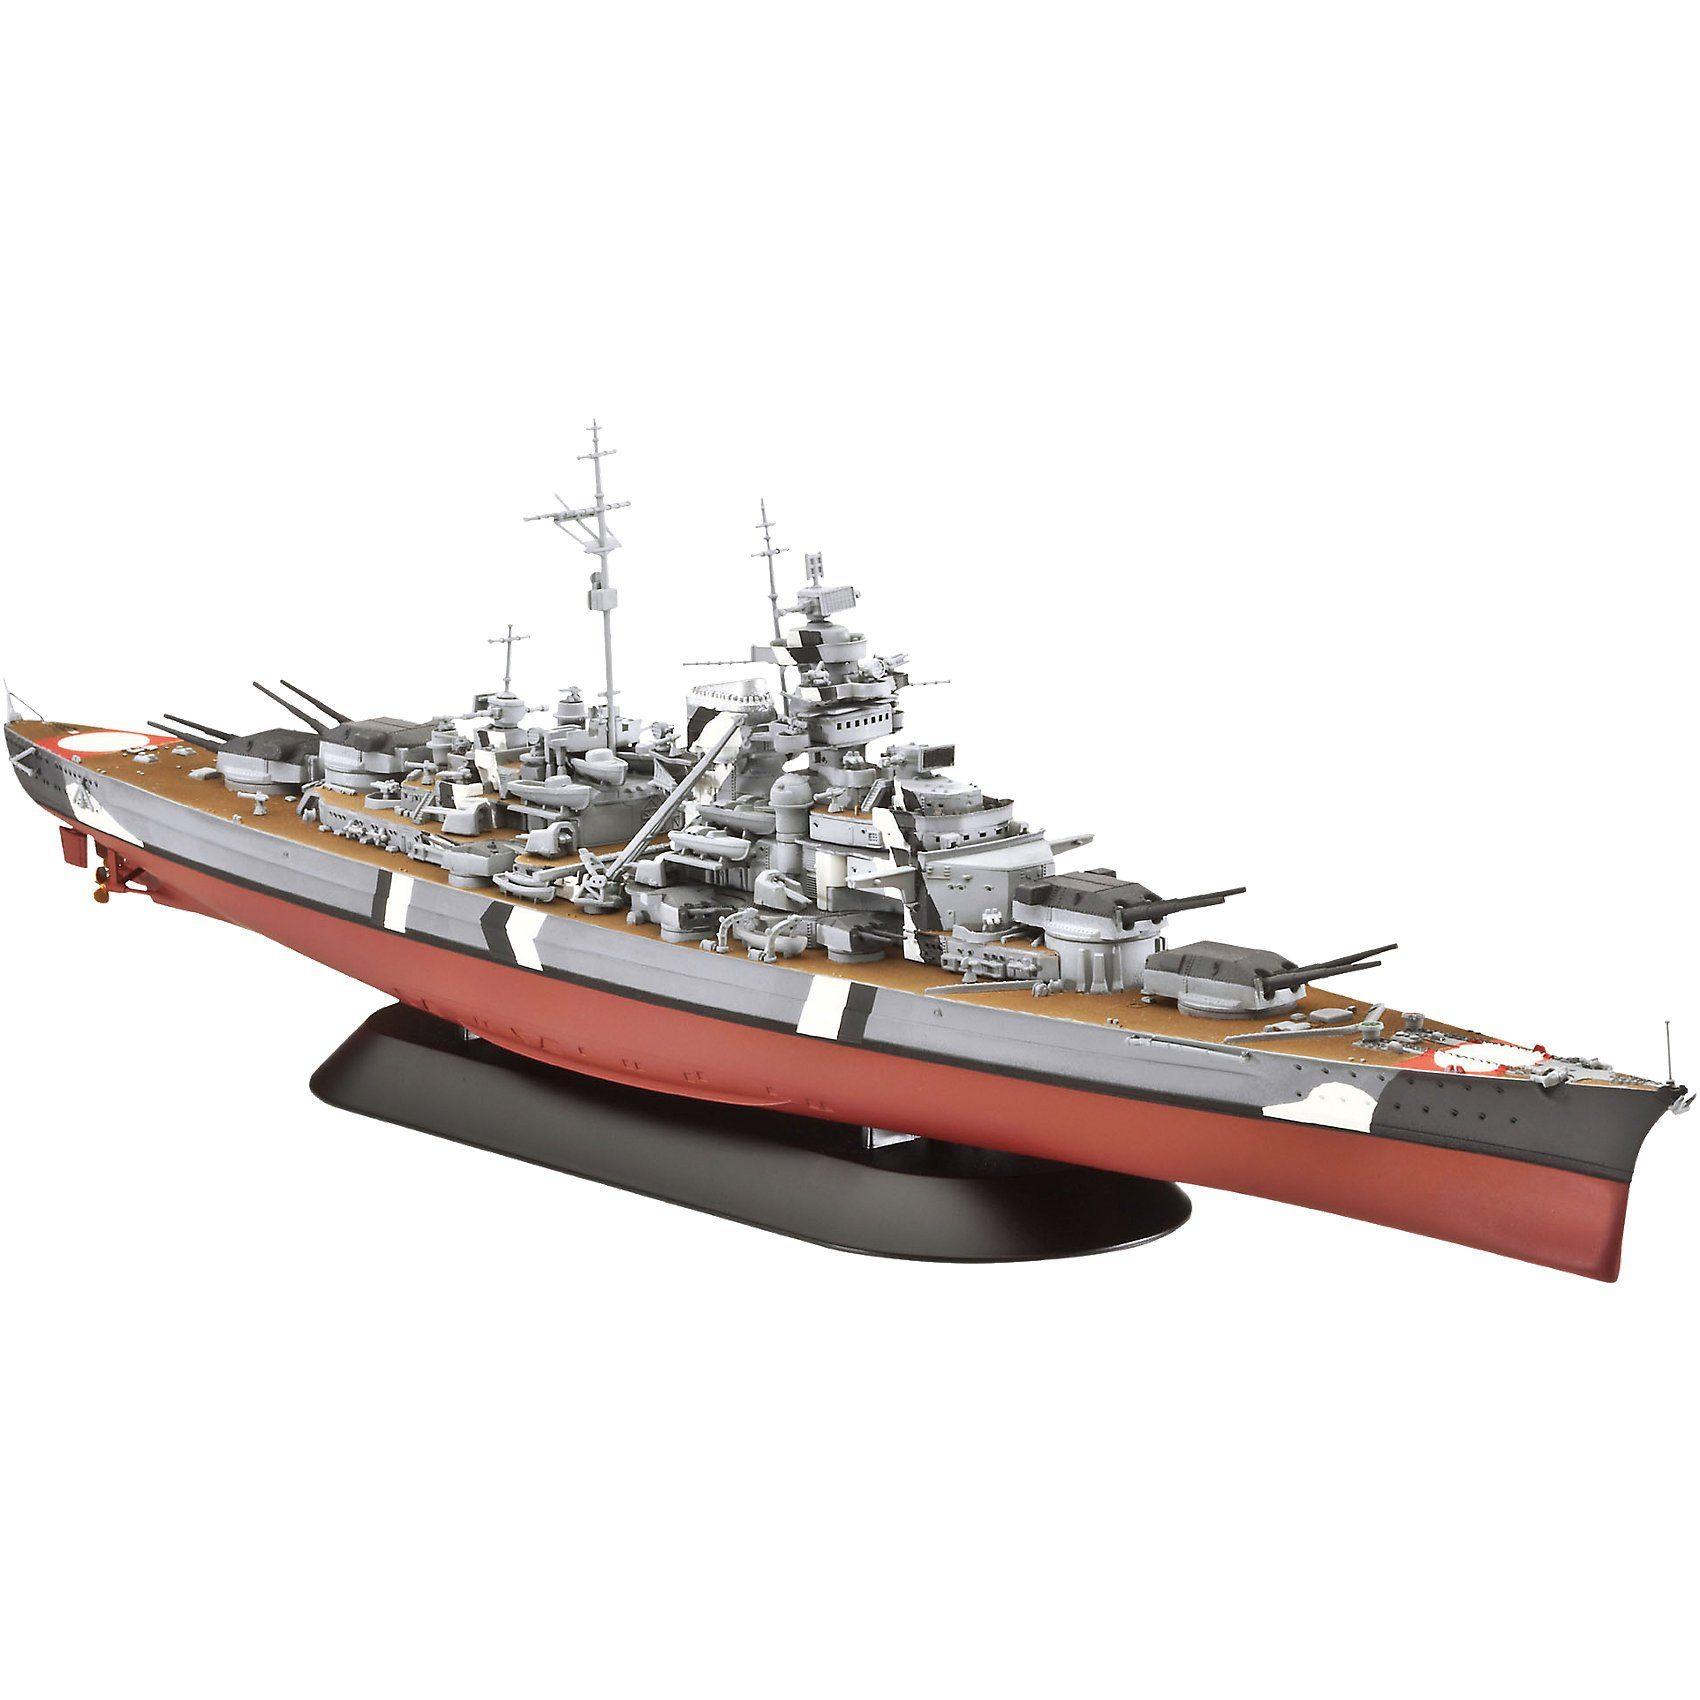 Revell Modellbausatz Battleship Bismarck 1:700